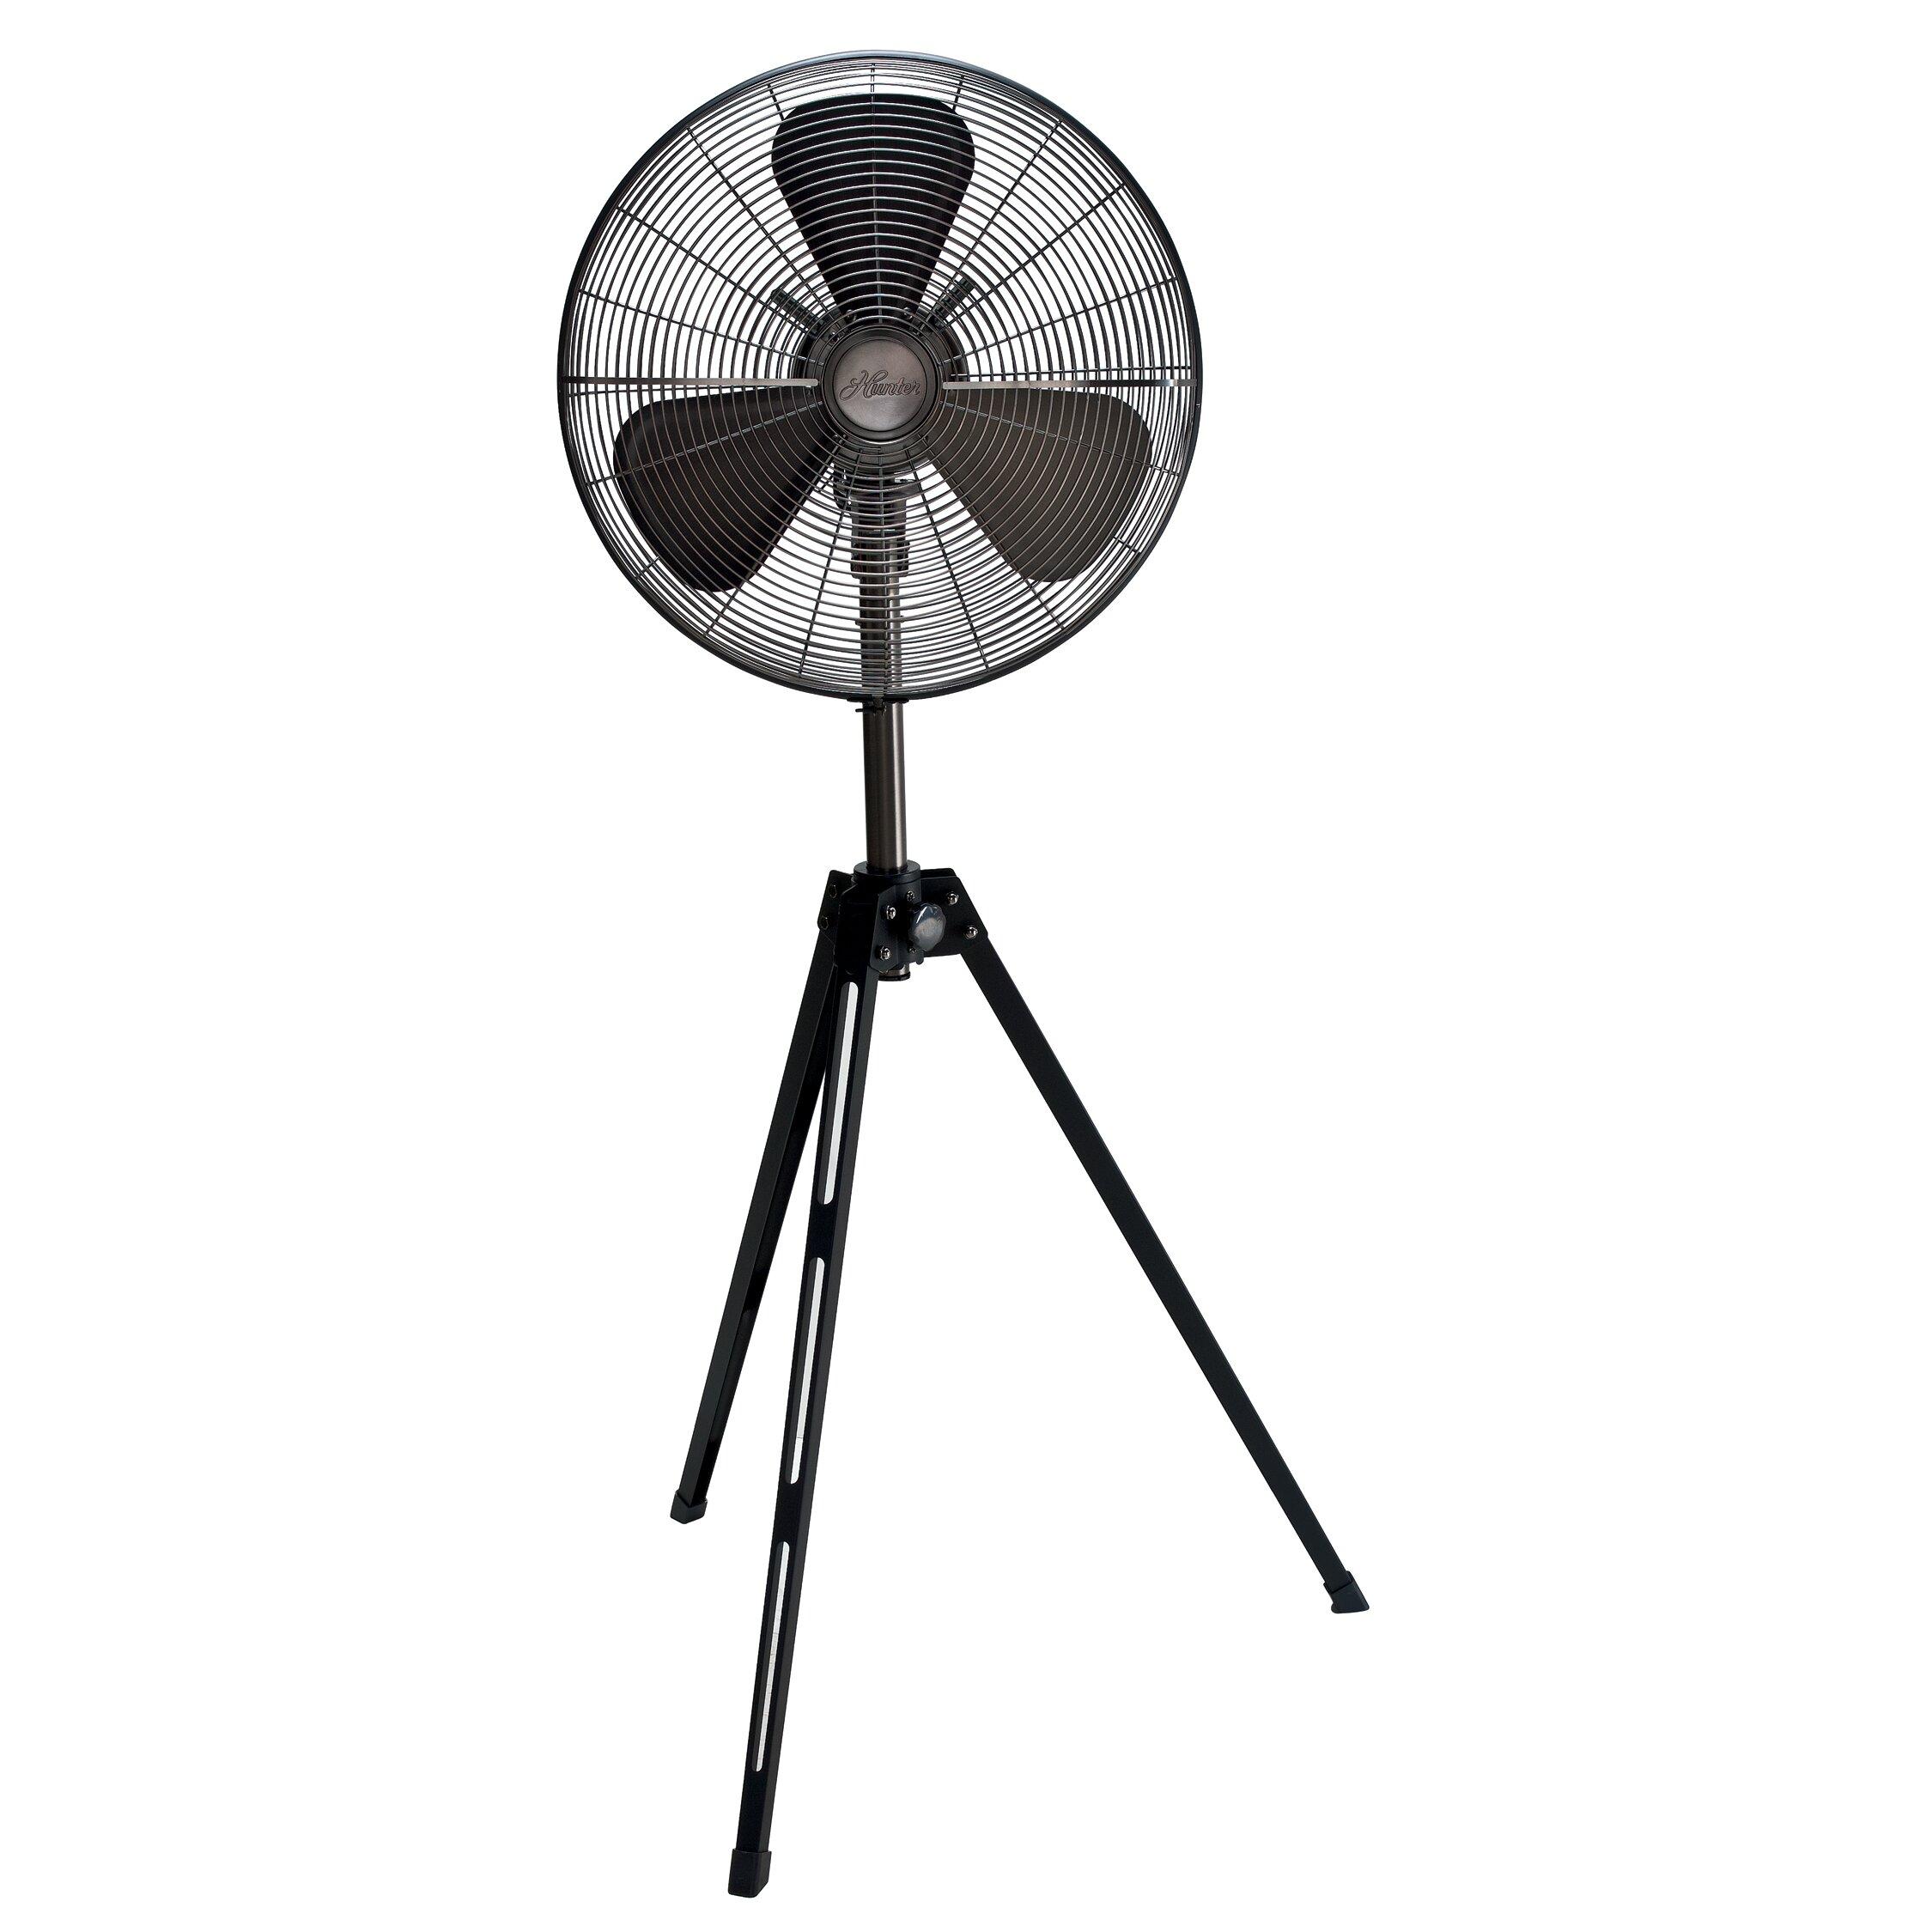 Hunter Home Comfort 16 Retro Tripod Stand Fan & Reviews Wayfair #51575C